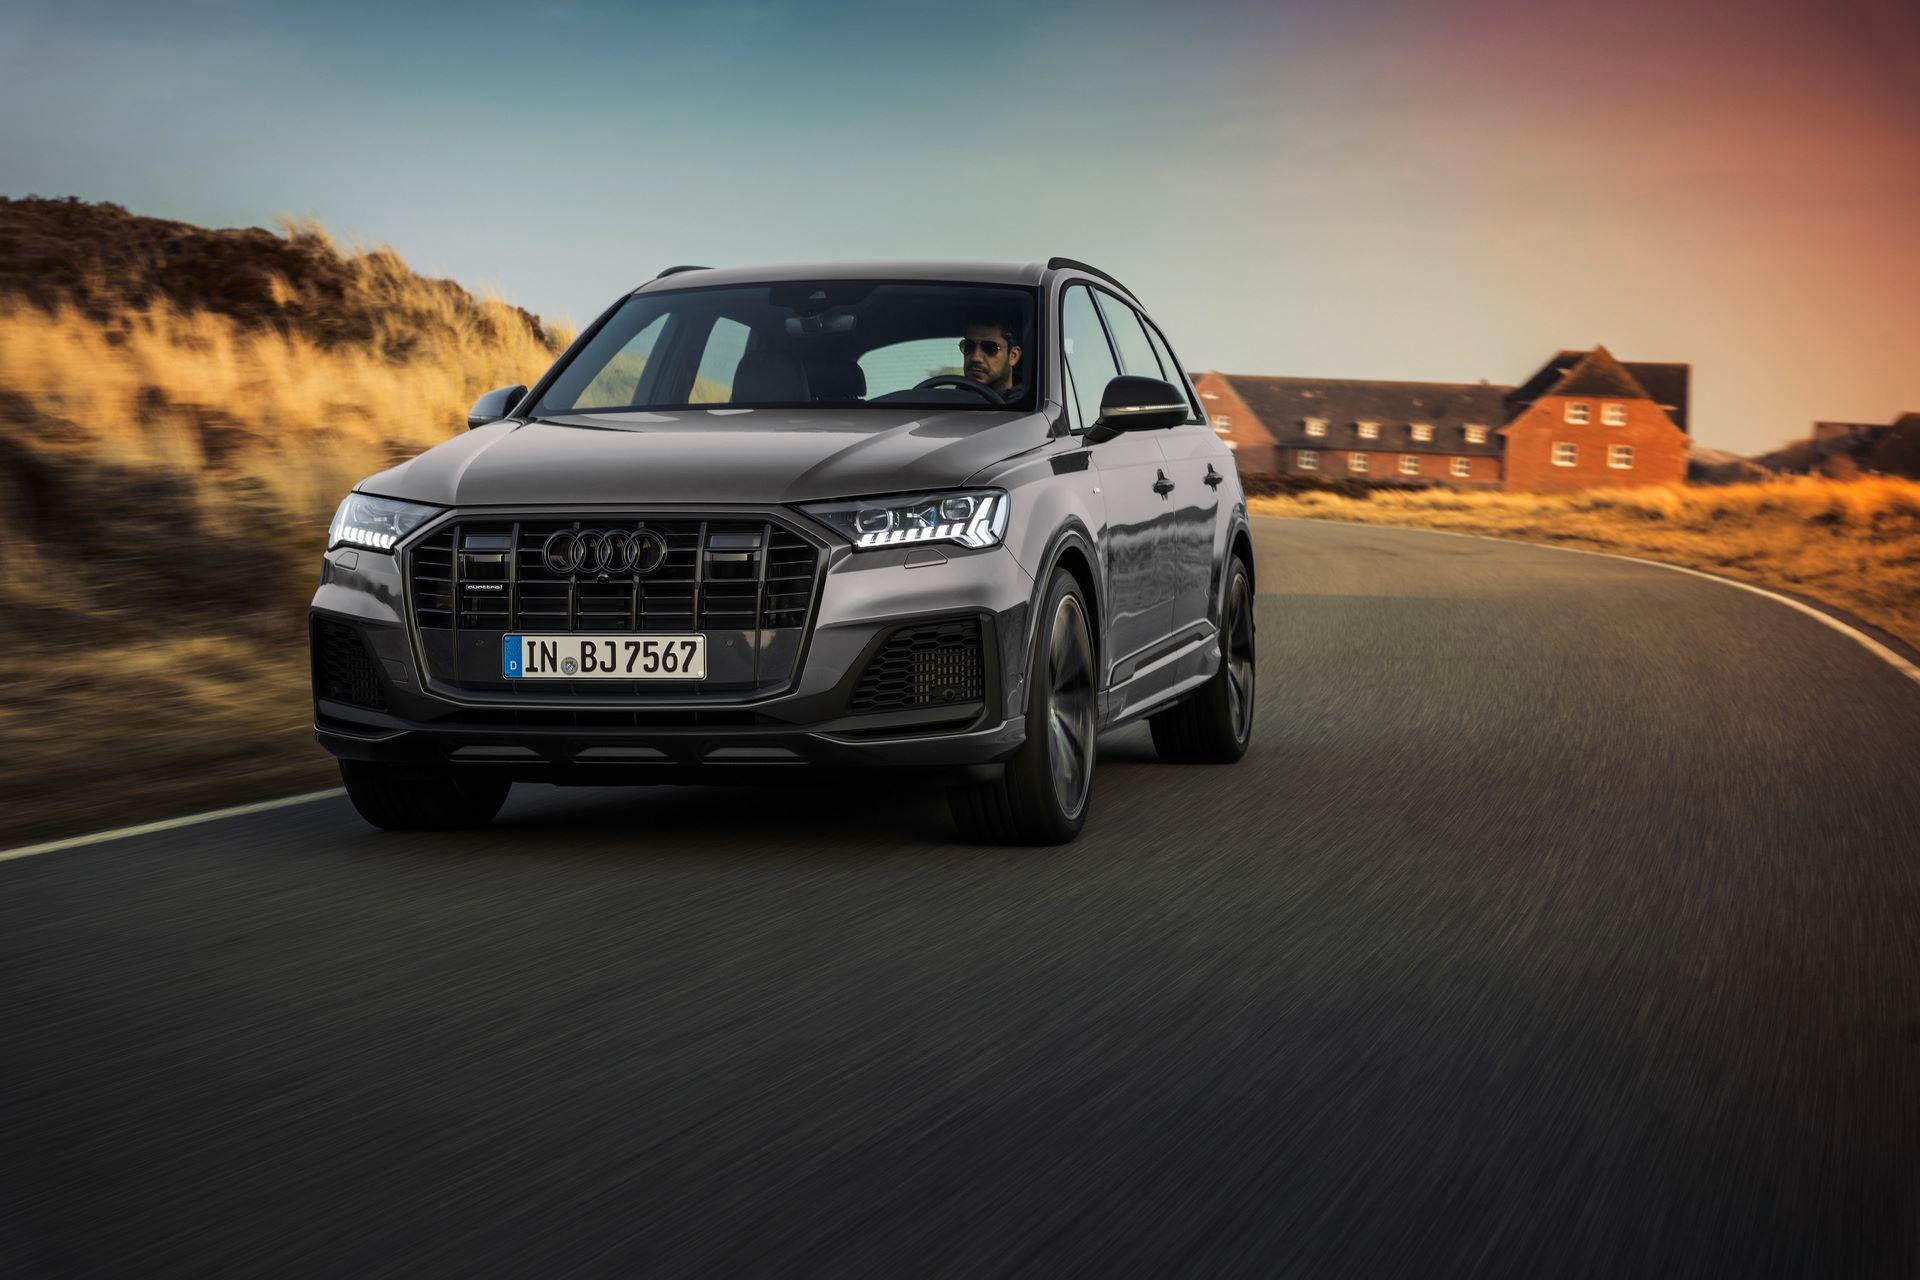 Audi-A4-A5-Q7-Q8-Competition-And-Competition-Plus-Trims-42